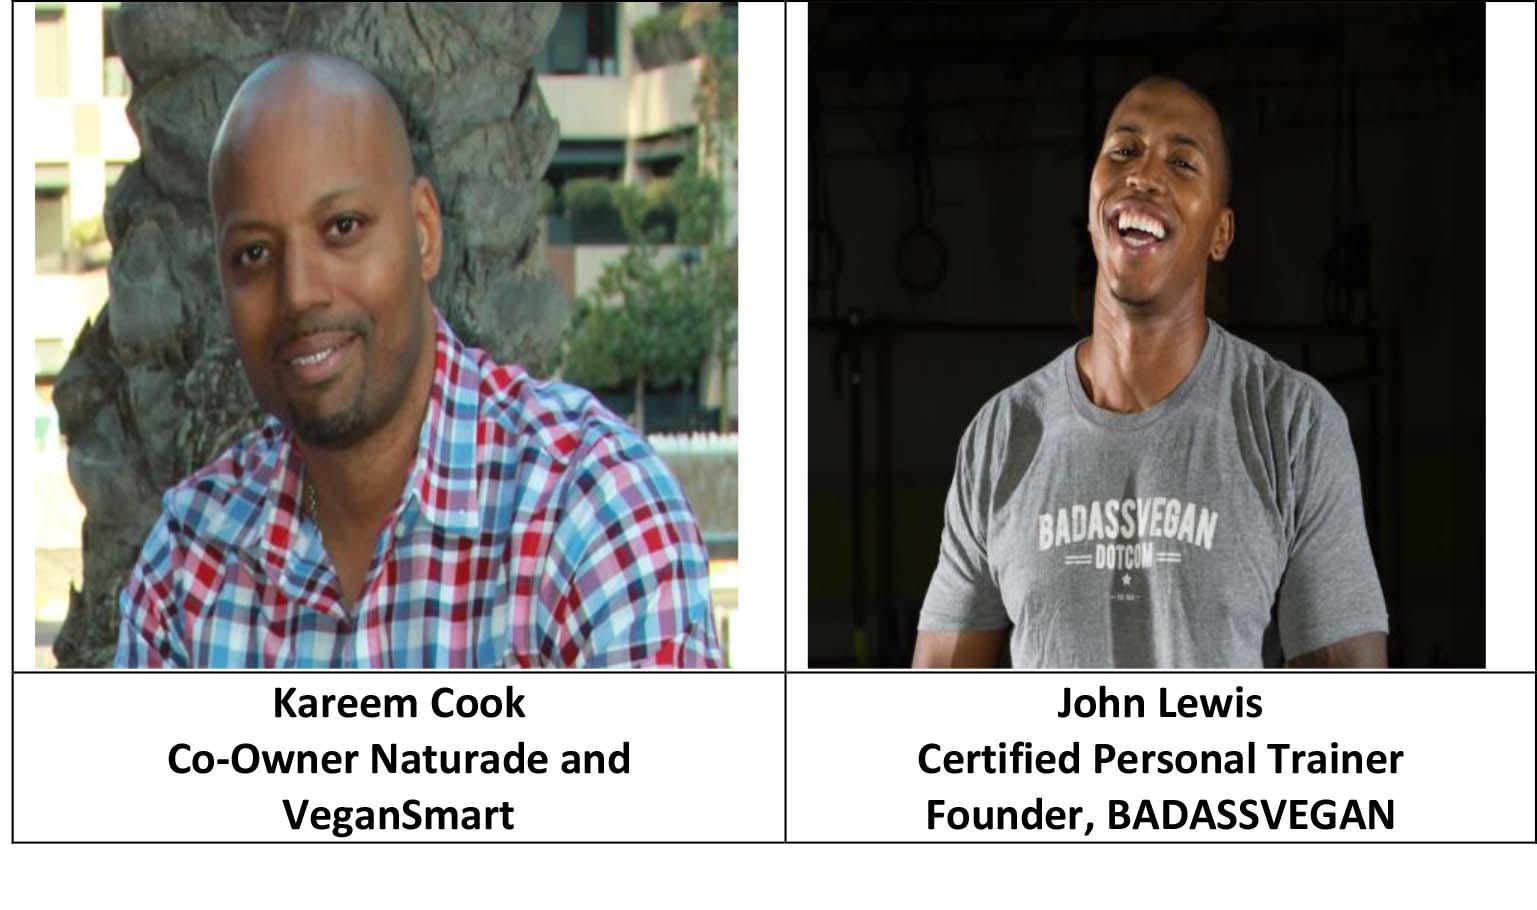 Kareem Cook and John Lewis